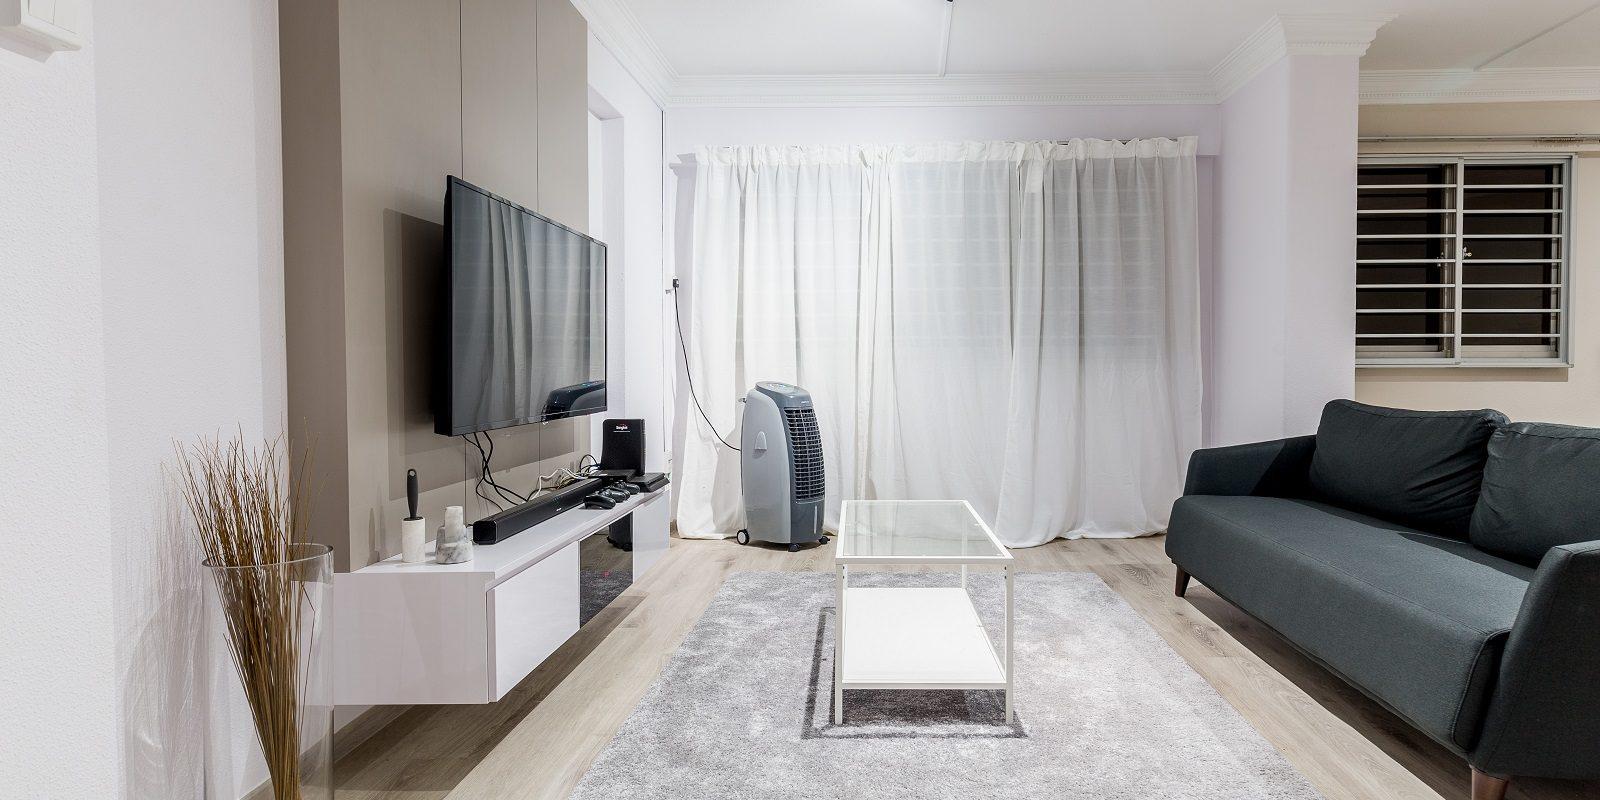 Homely Minimalist Interior Design